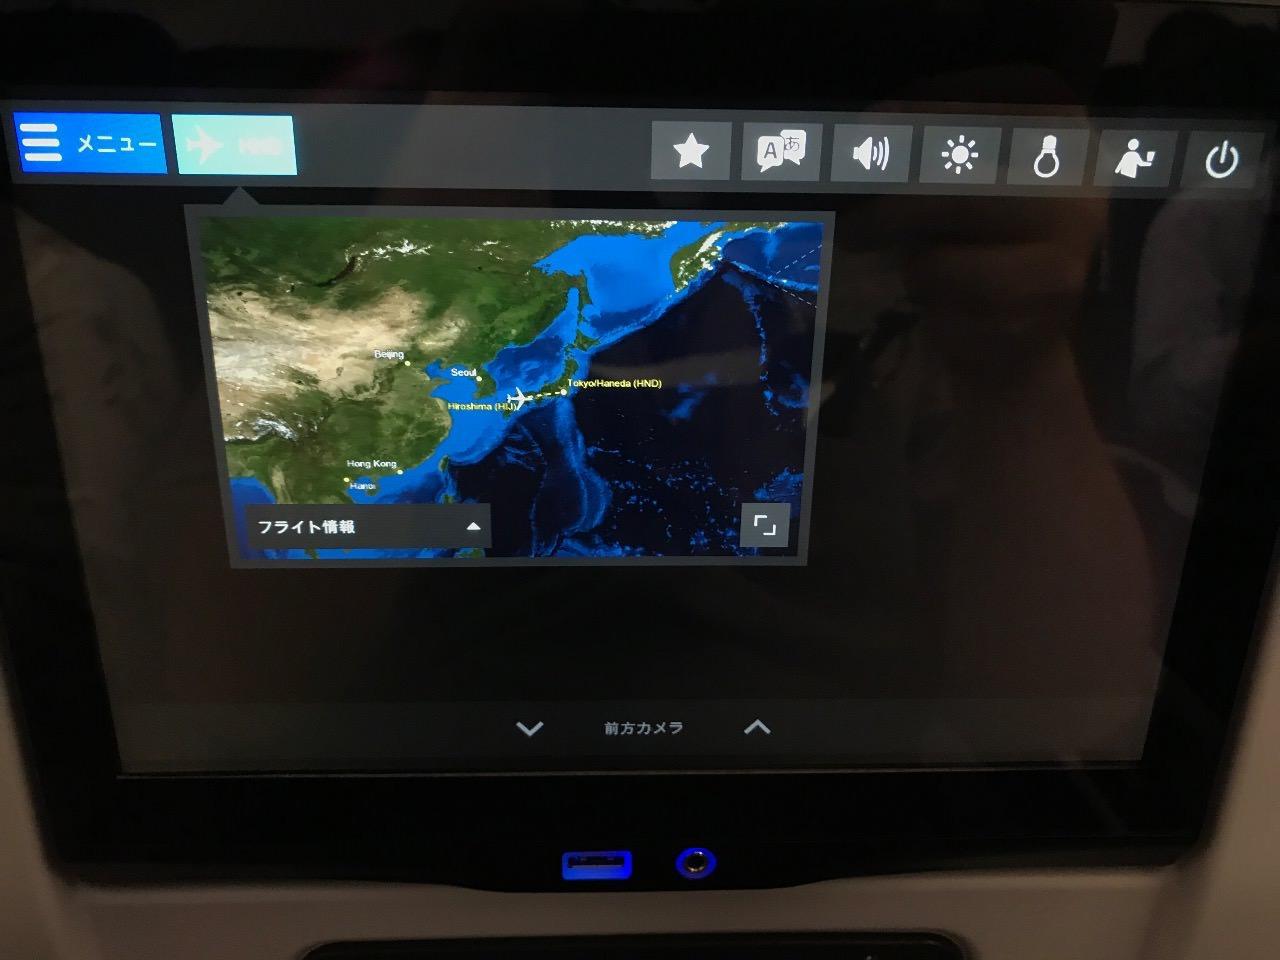 【動画】エアバス「A321neo」広島空港→羽田空港【着陸】